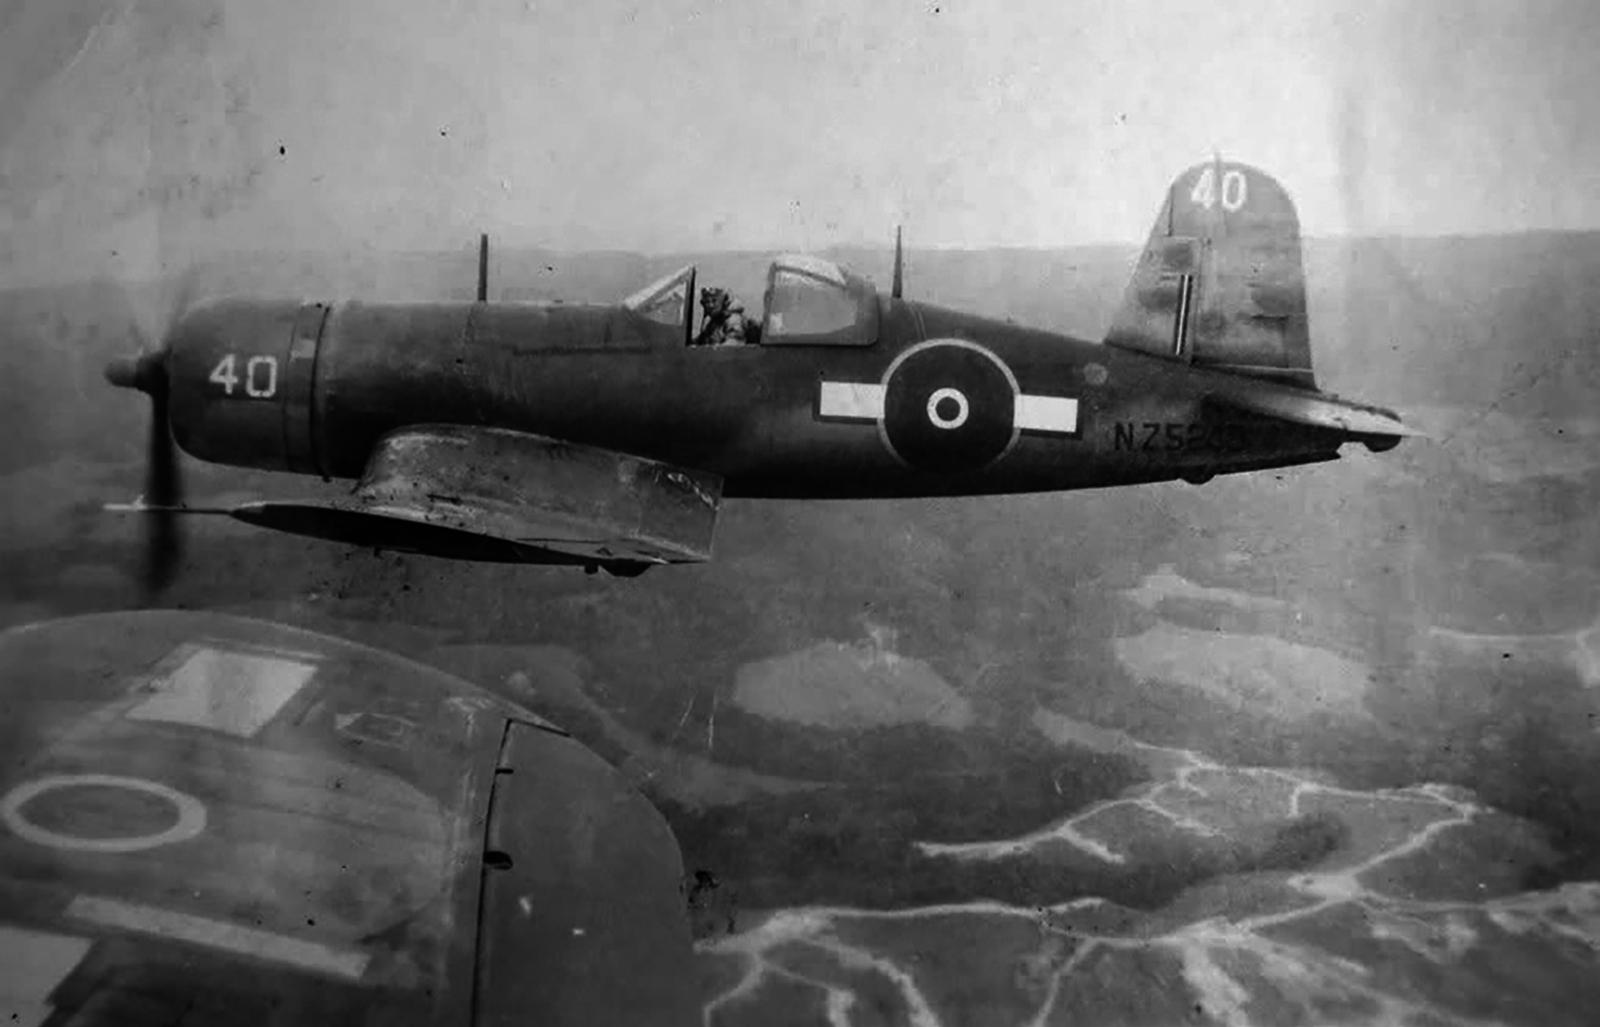 Vought-F4U-1A-Corsair-RNZAF-as-NZ5240-Bu